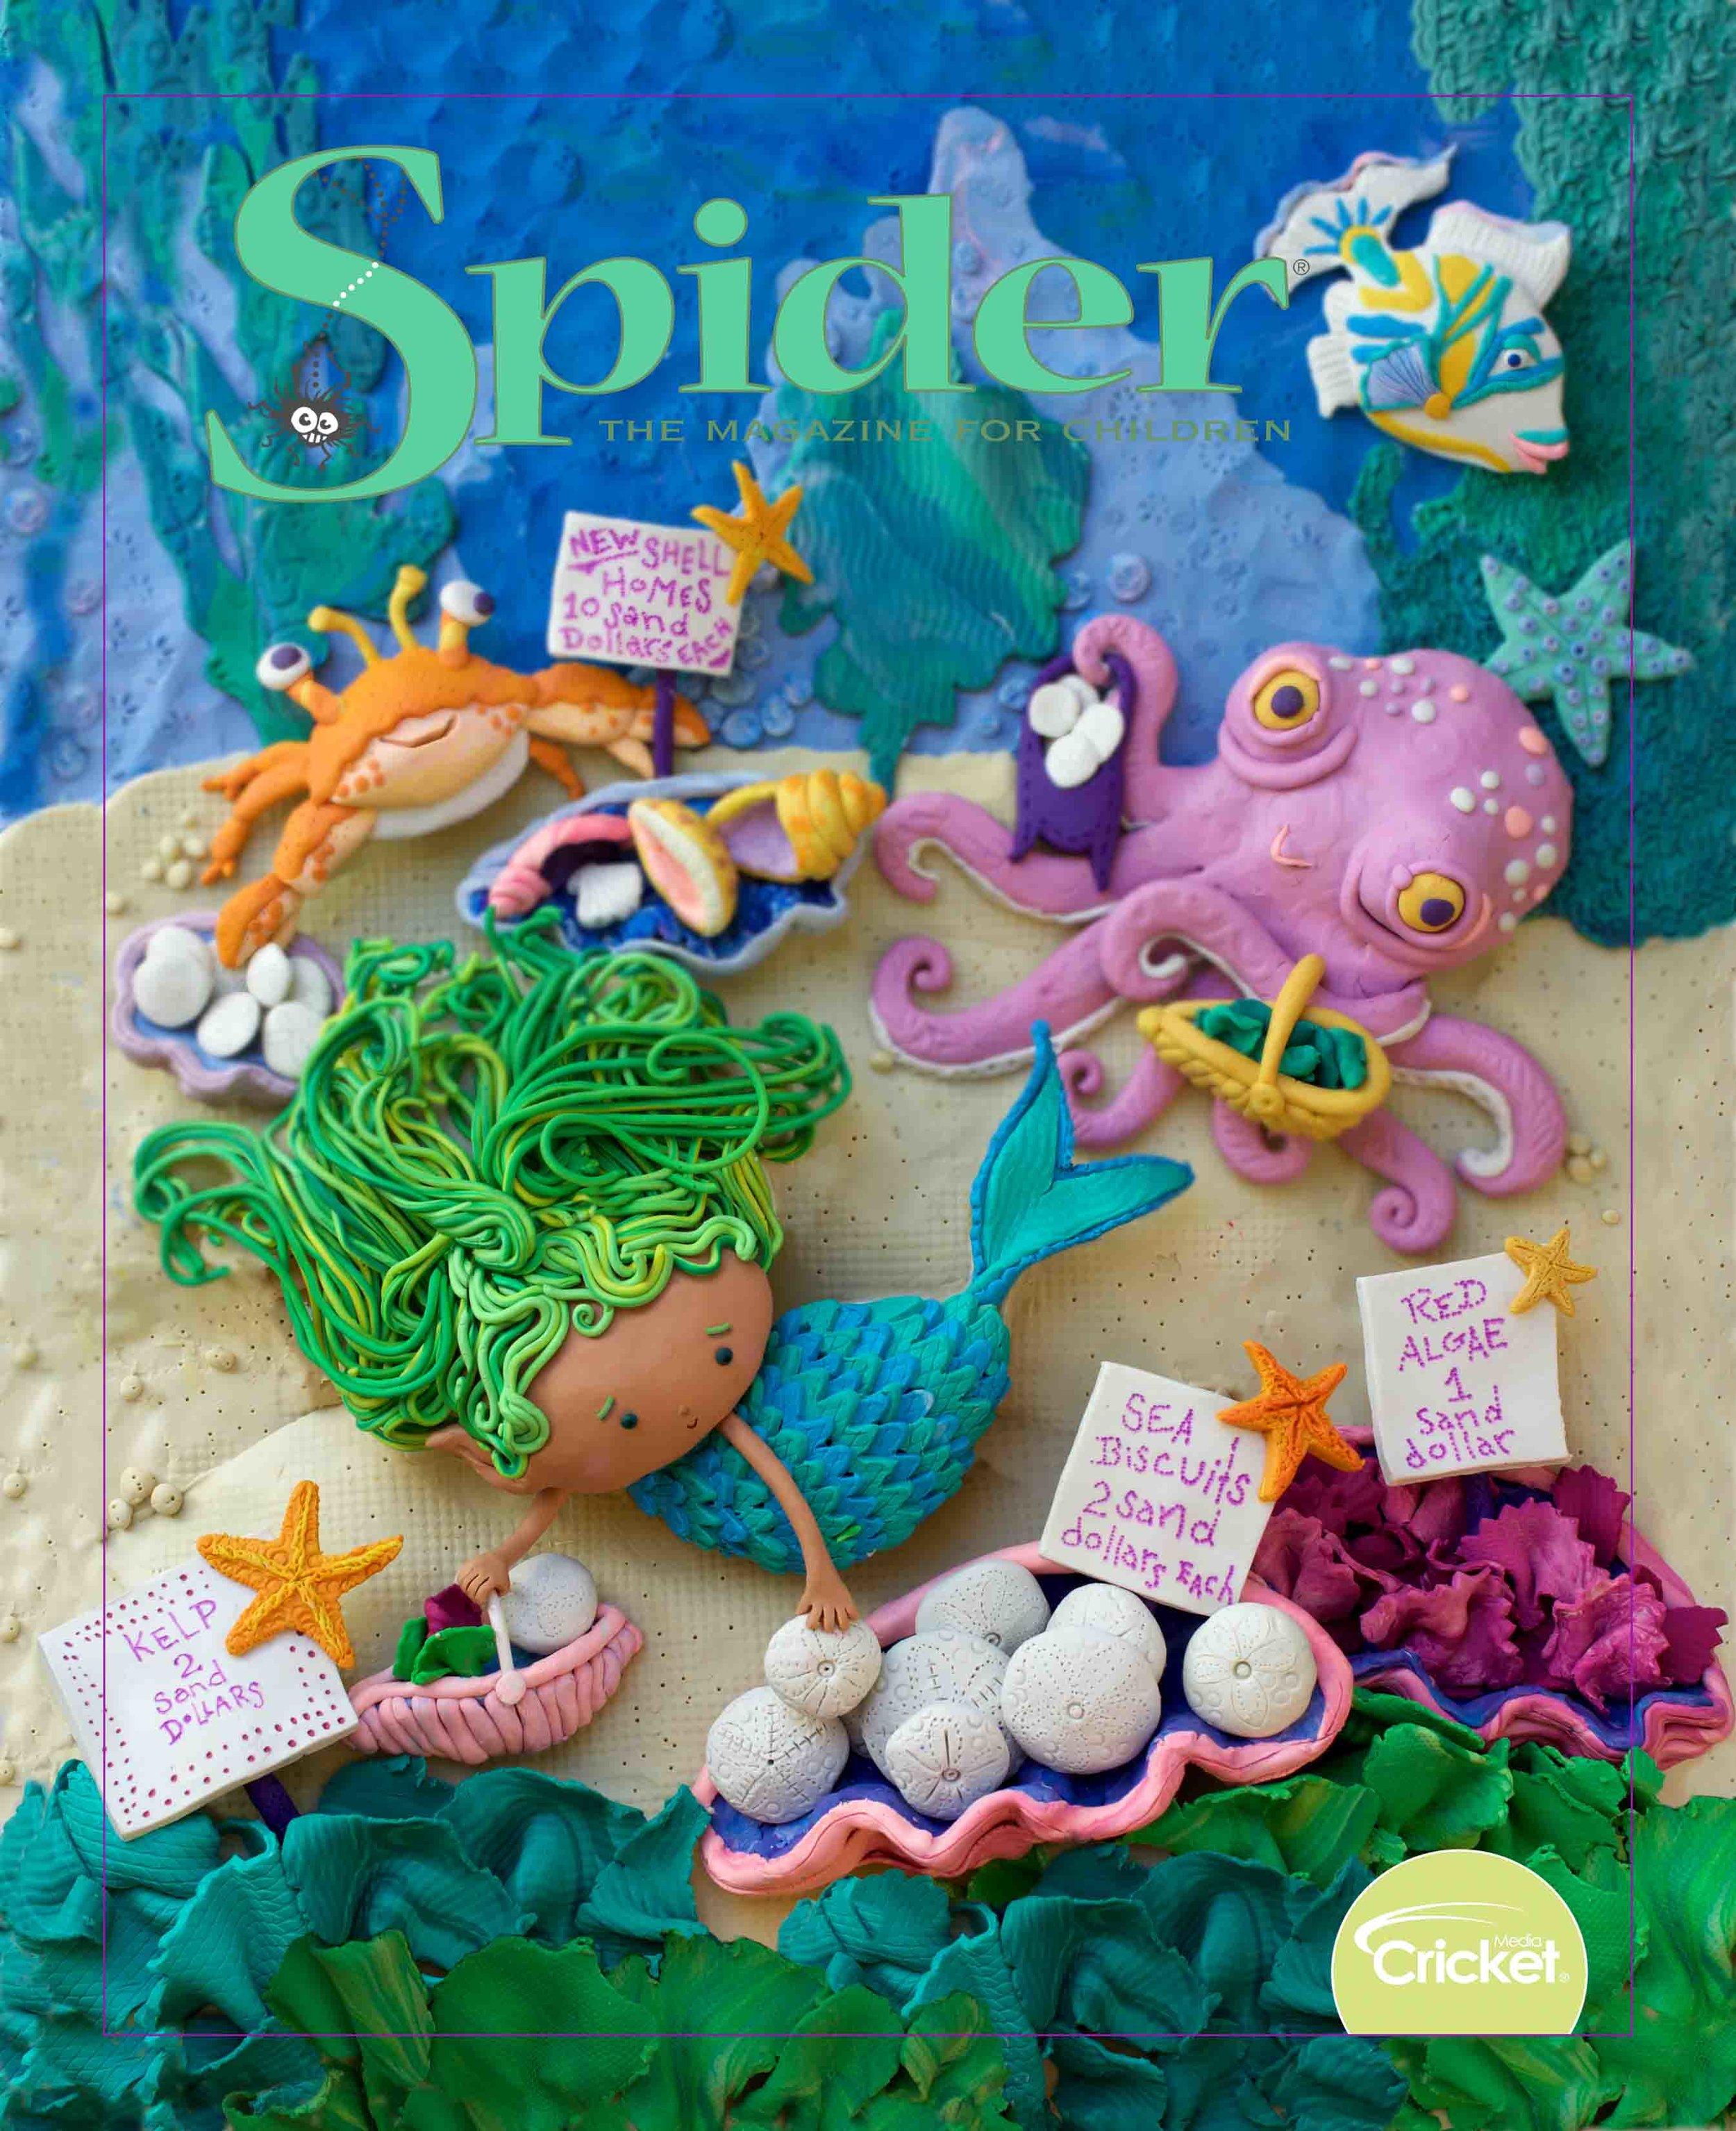 August 2019 Spider Magazine Cover